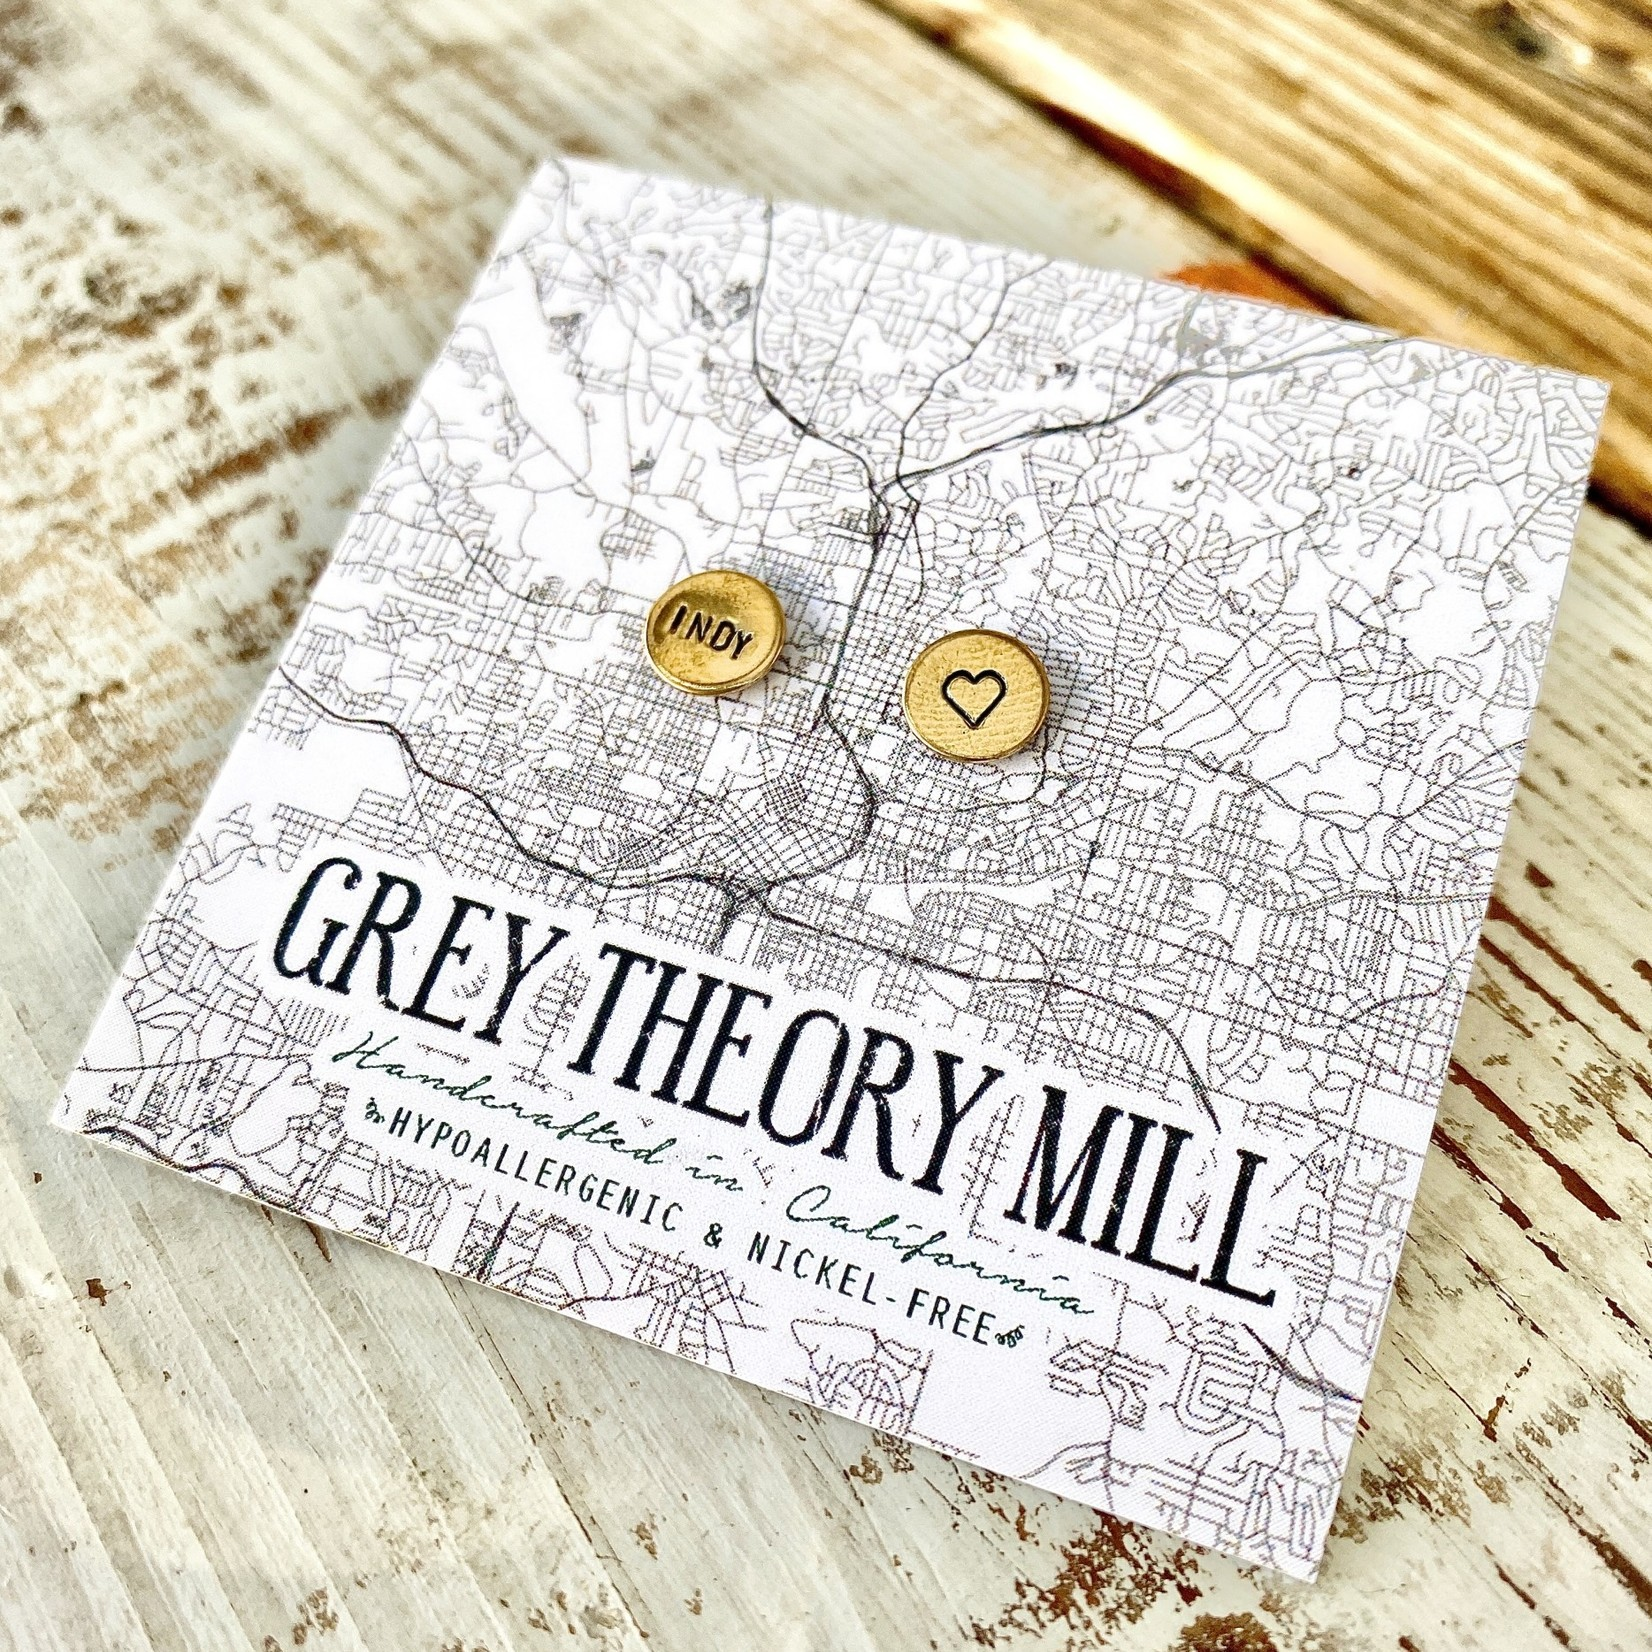 Grey Theory Mill INDY (Heart) Stud Earrings